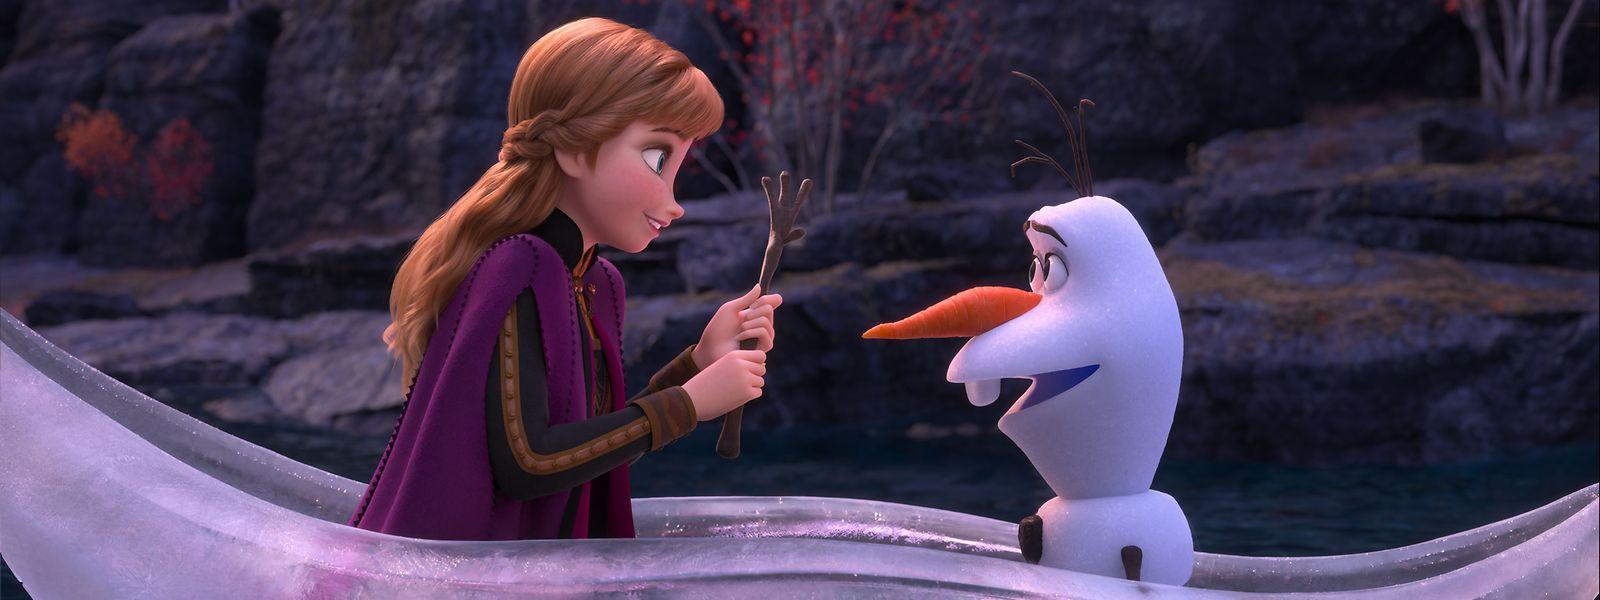 Anna et Olaf assisteront Elsa dans sa quête.